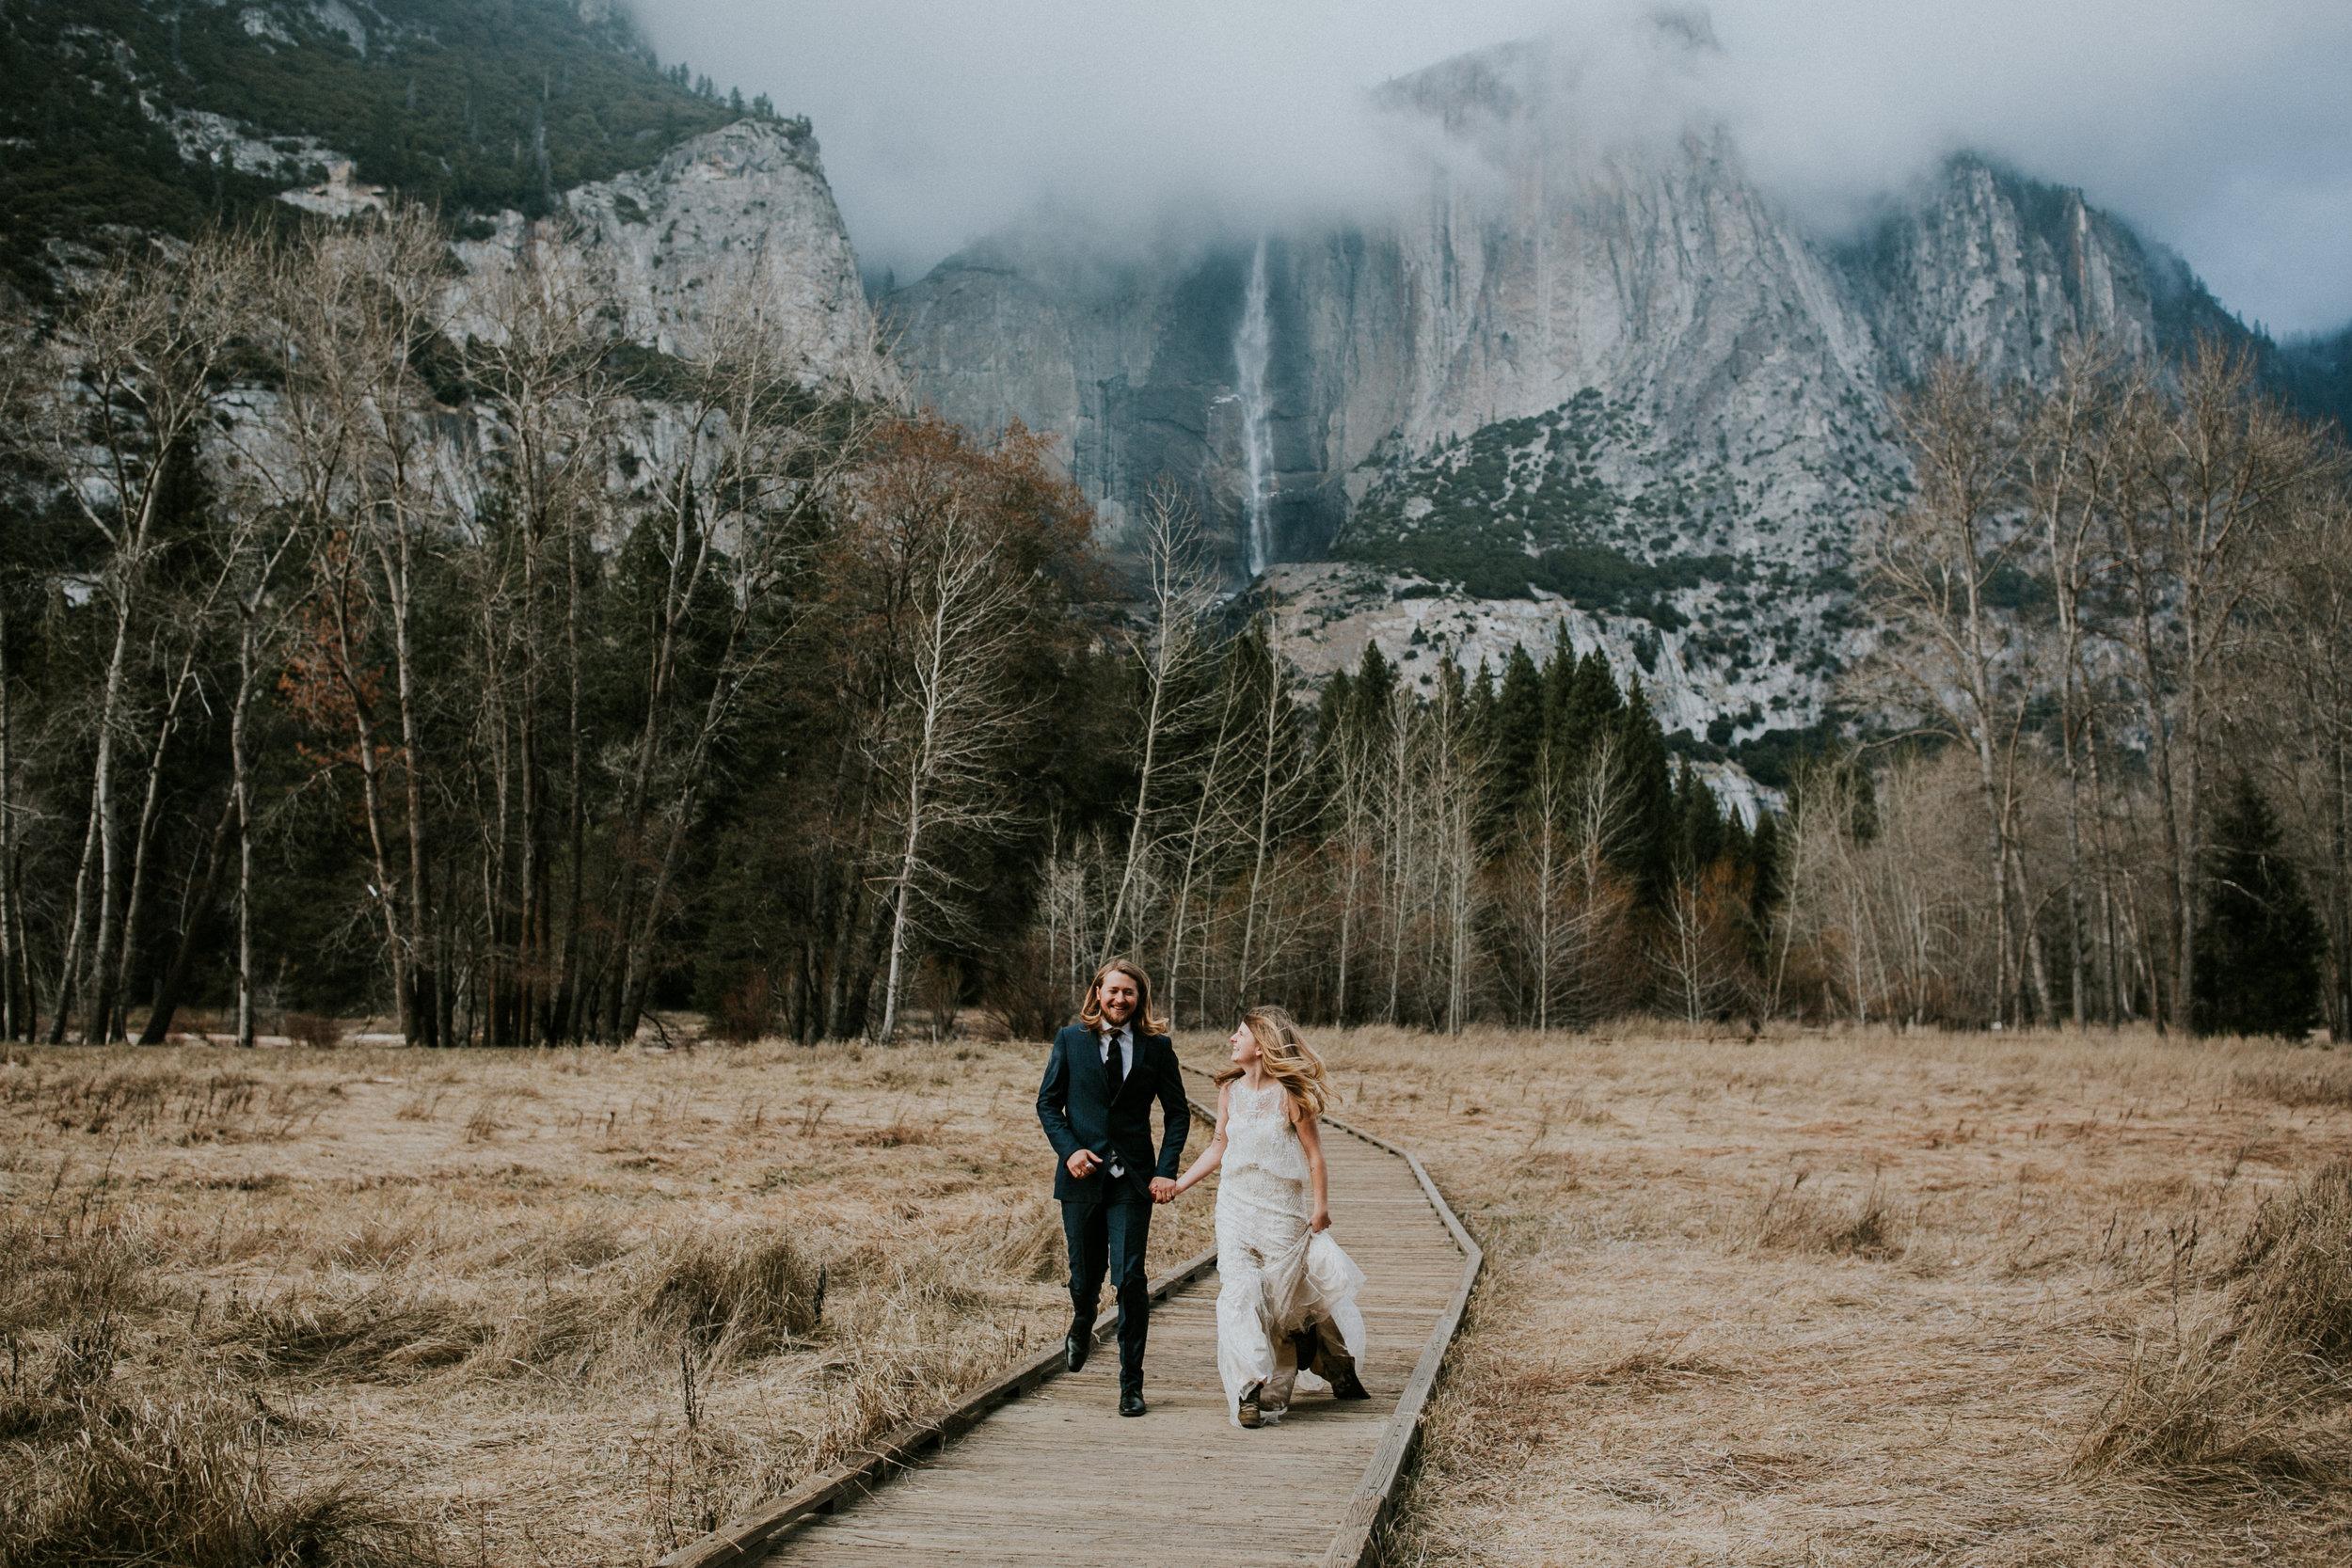 adventure-california-yosemite-photographer-grace-t-photography-95.jpg